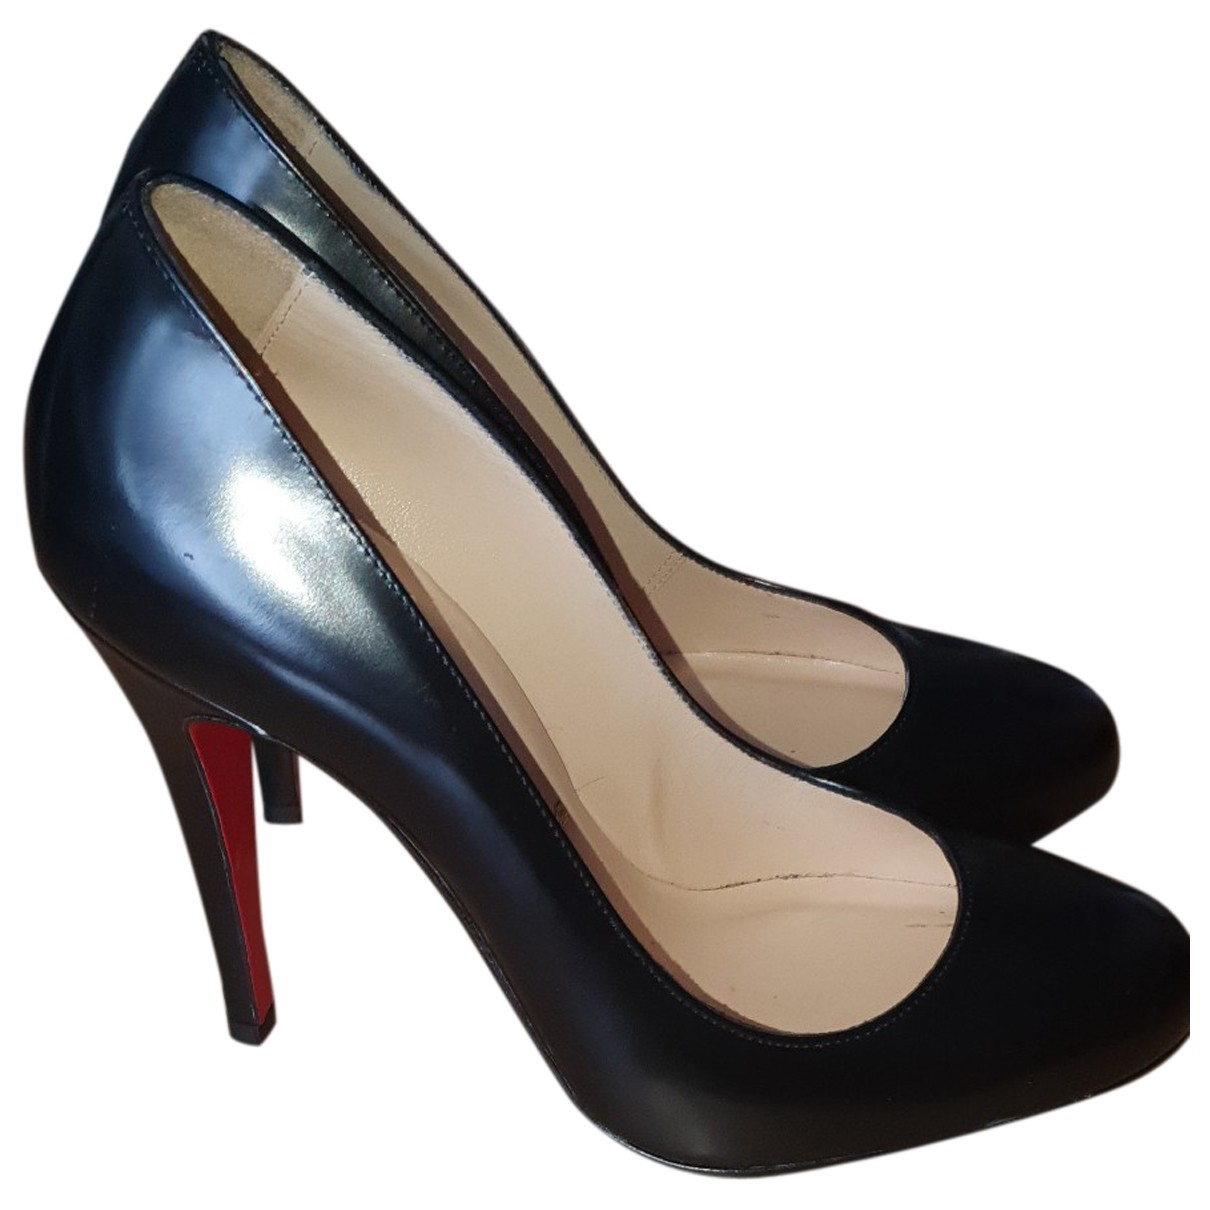 Christian Louboutin Simple pump Black Leather Heels for Women 3 UK